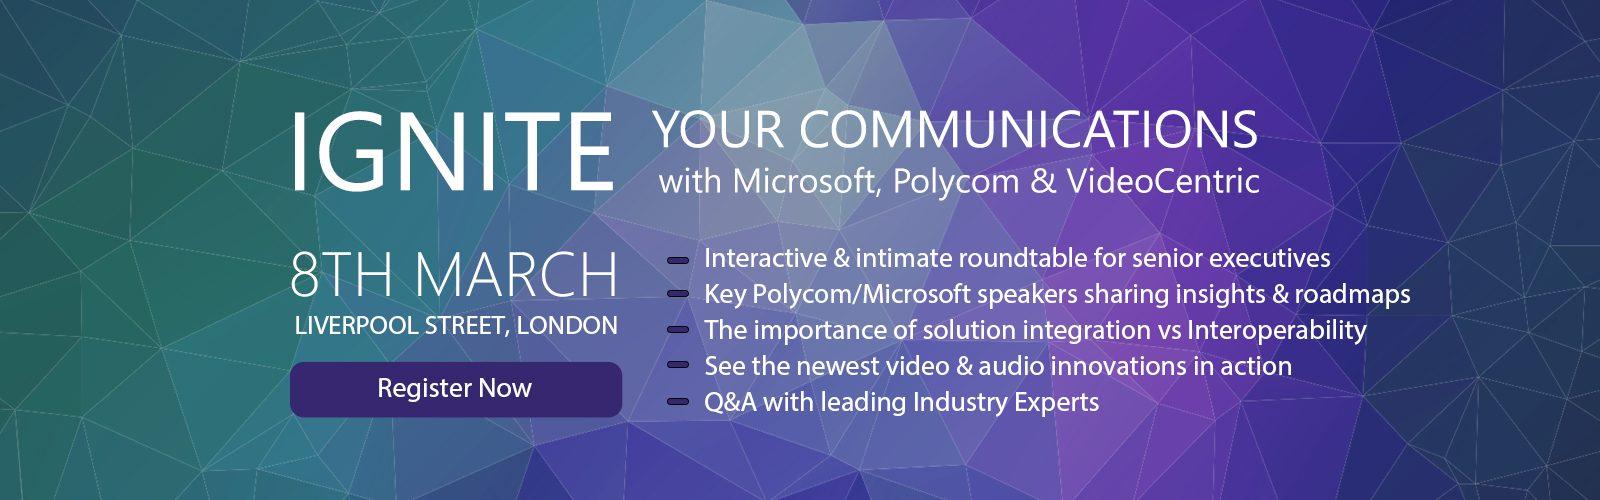 IGNITE UK Microsoft and Polycom integration day slider